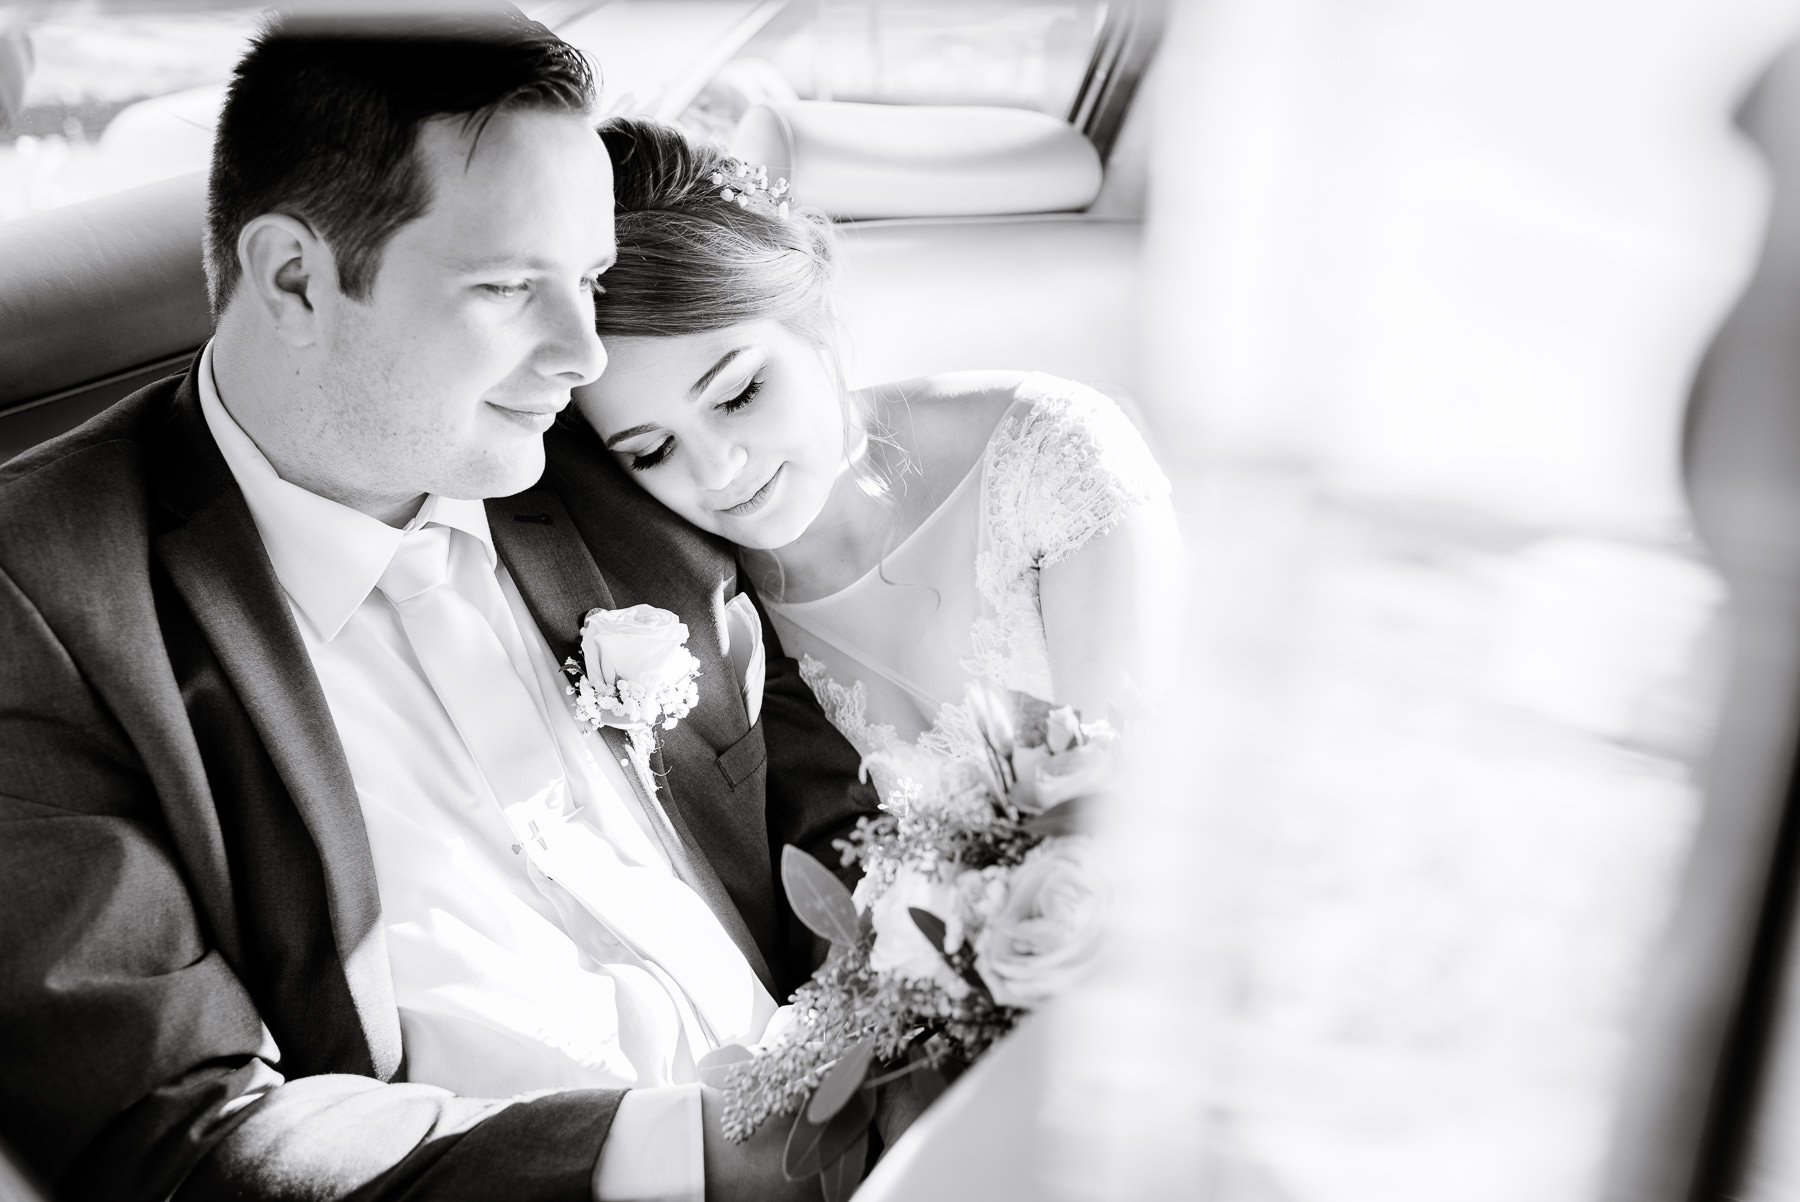 Bride and Groom in their wedding car at the Alma Inn, Burnley